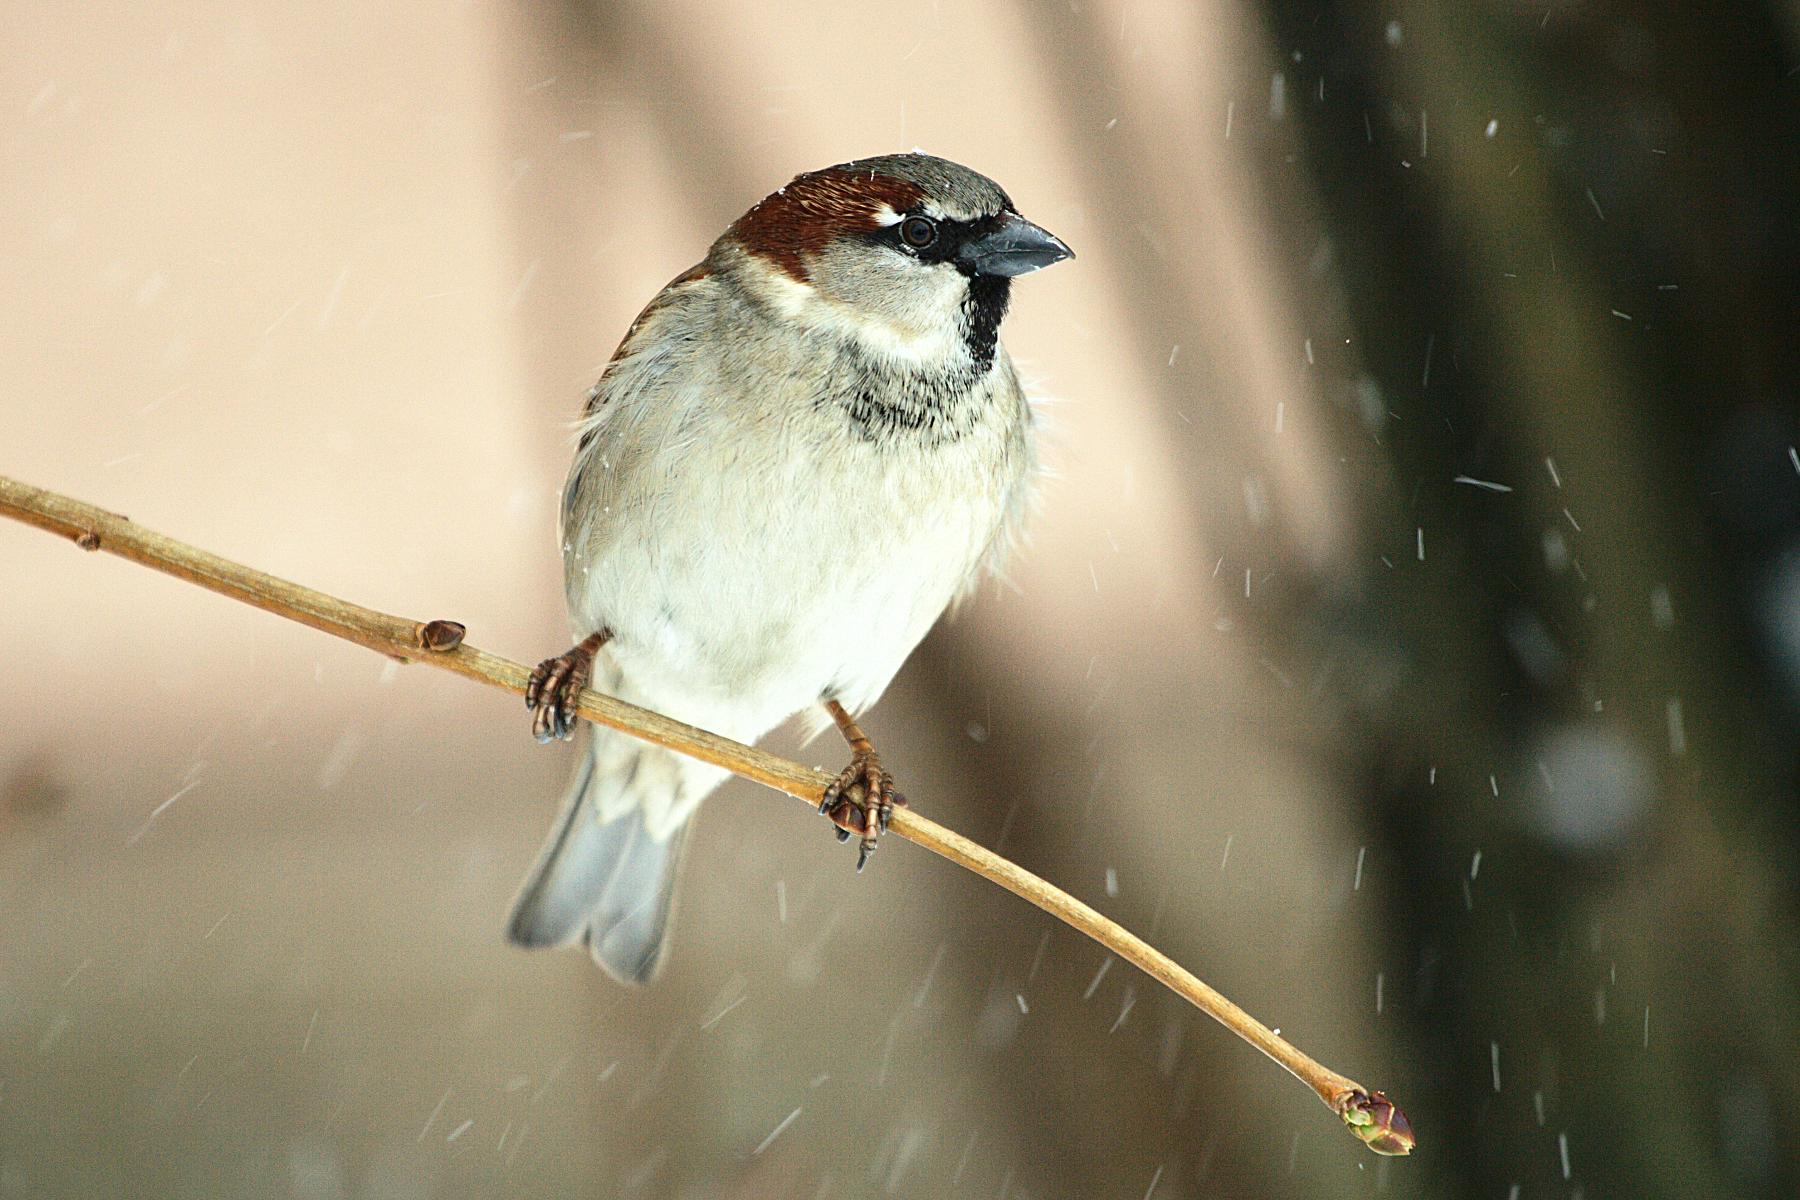 Sparrow Via @Atisgailis